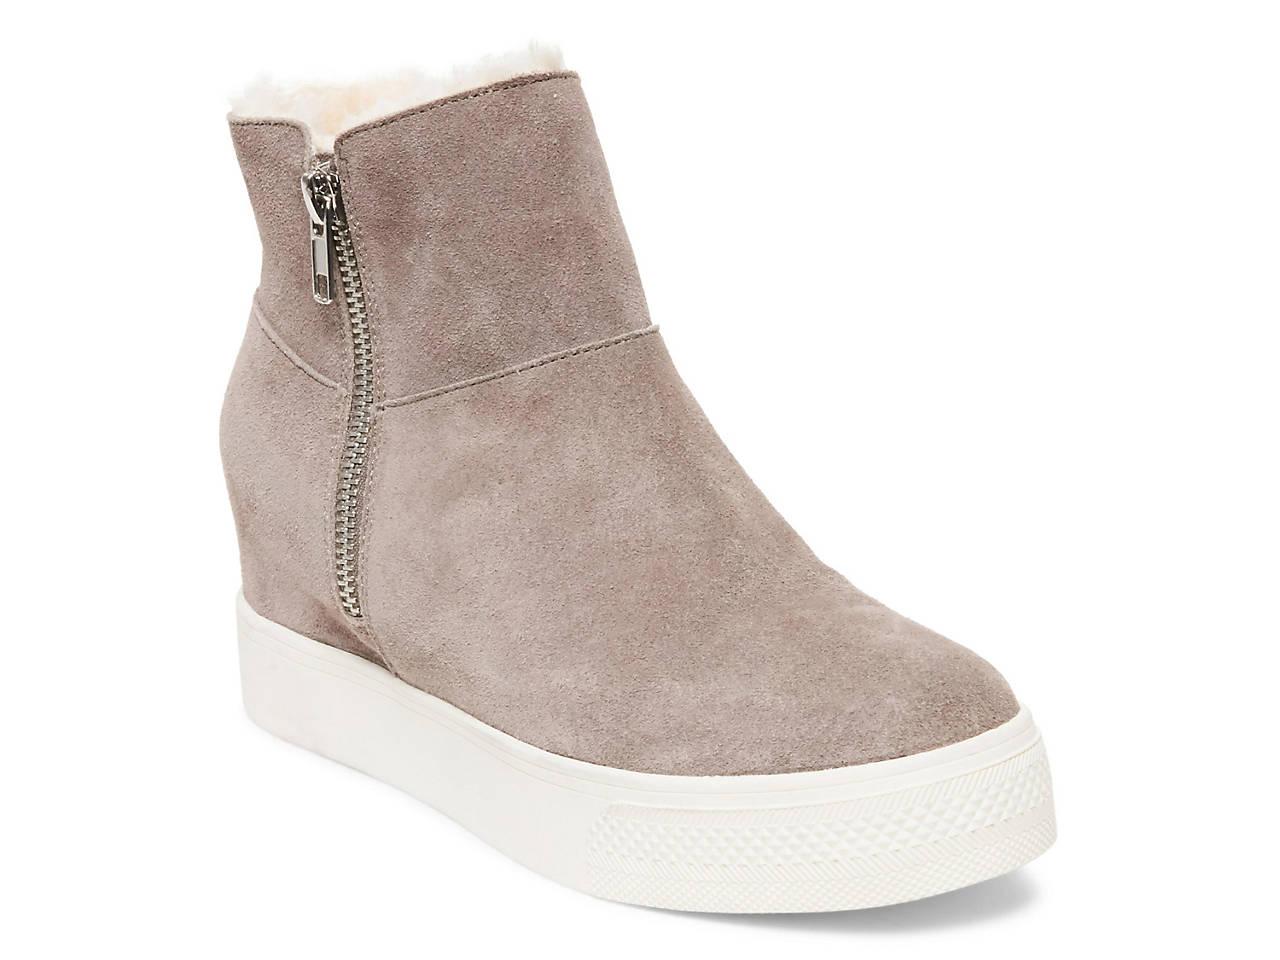 3a624c64d50 Steve Madden Wanda Wedge Sneaker Women s Shoes